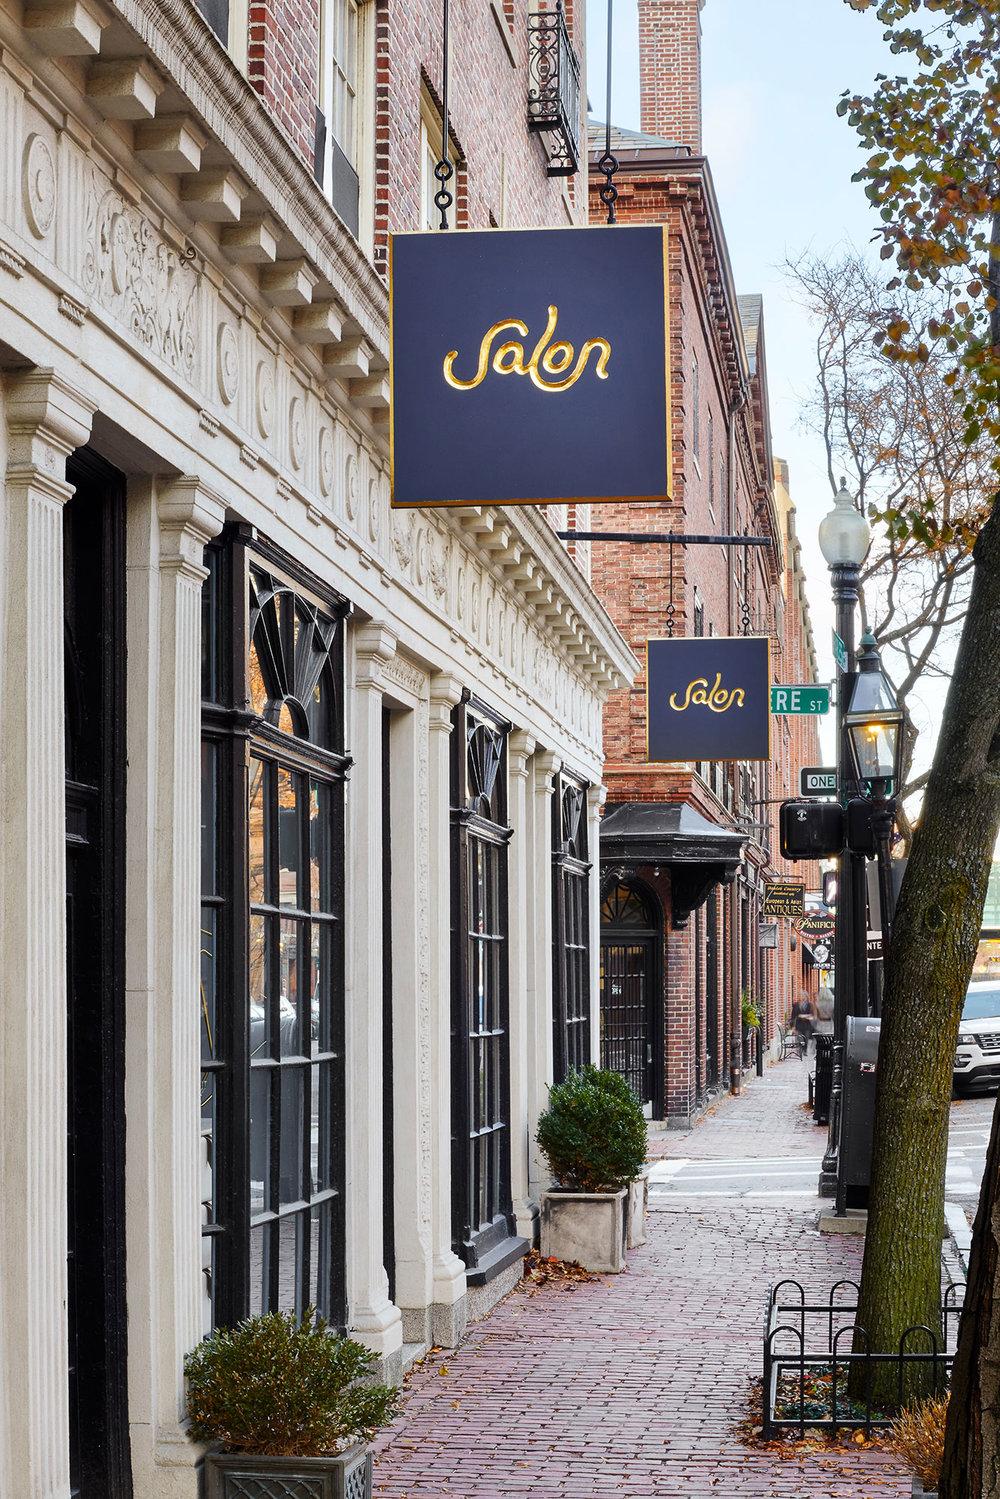 salon-street-sign-boston.jpg